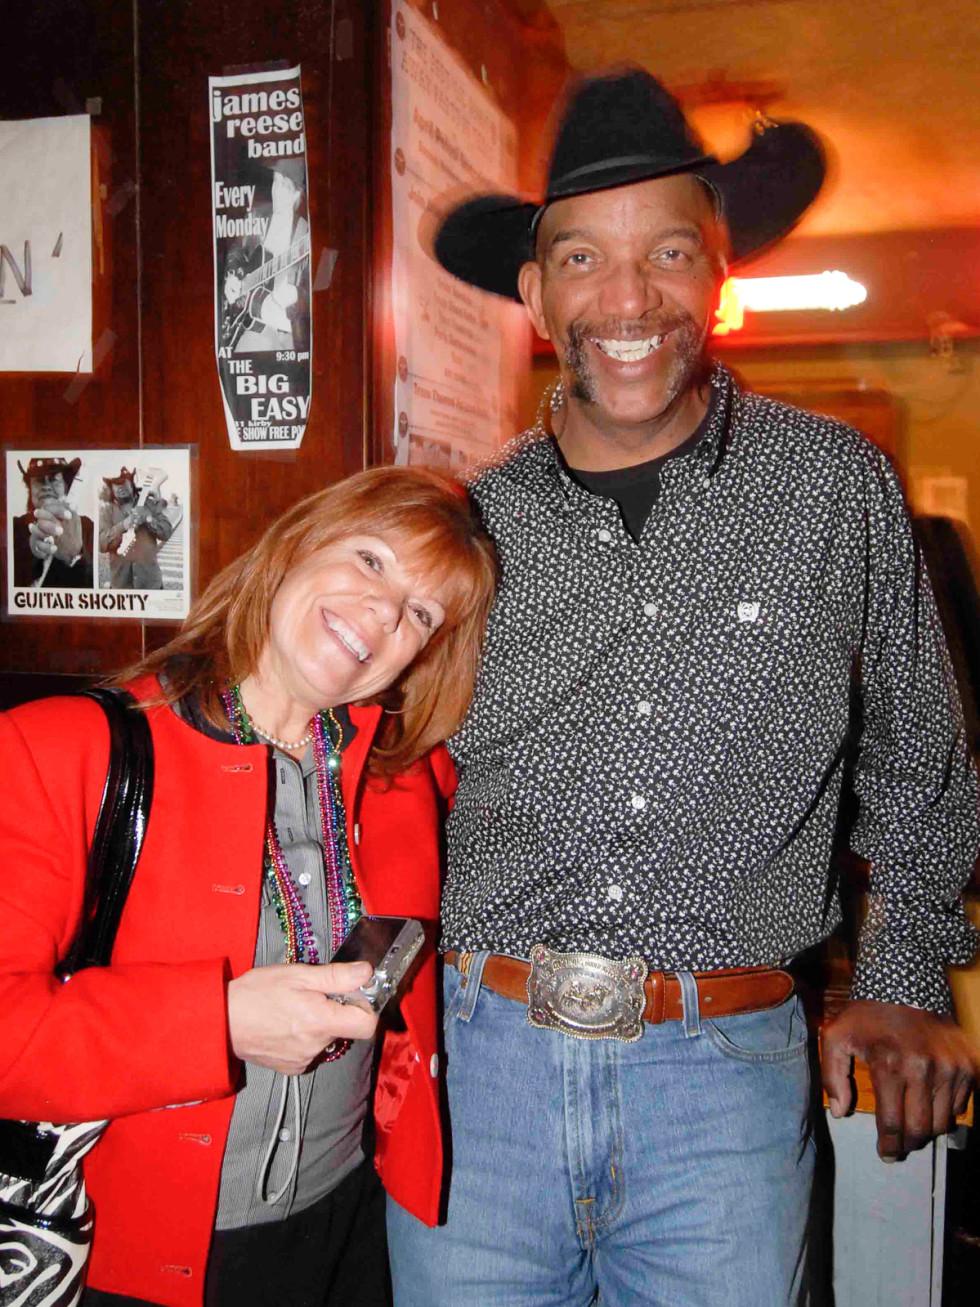 News_The Big Easy_Feb. 2010_Linda Jack_Bo Lundford